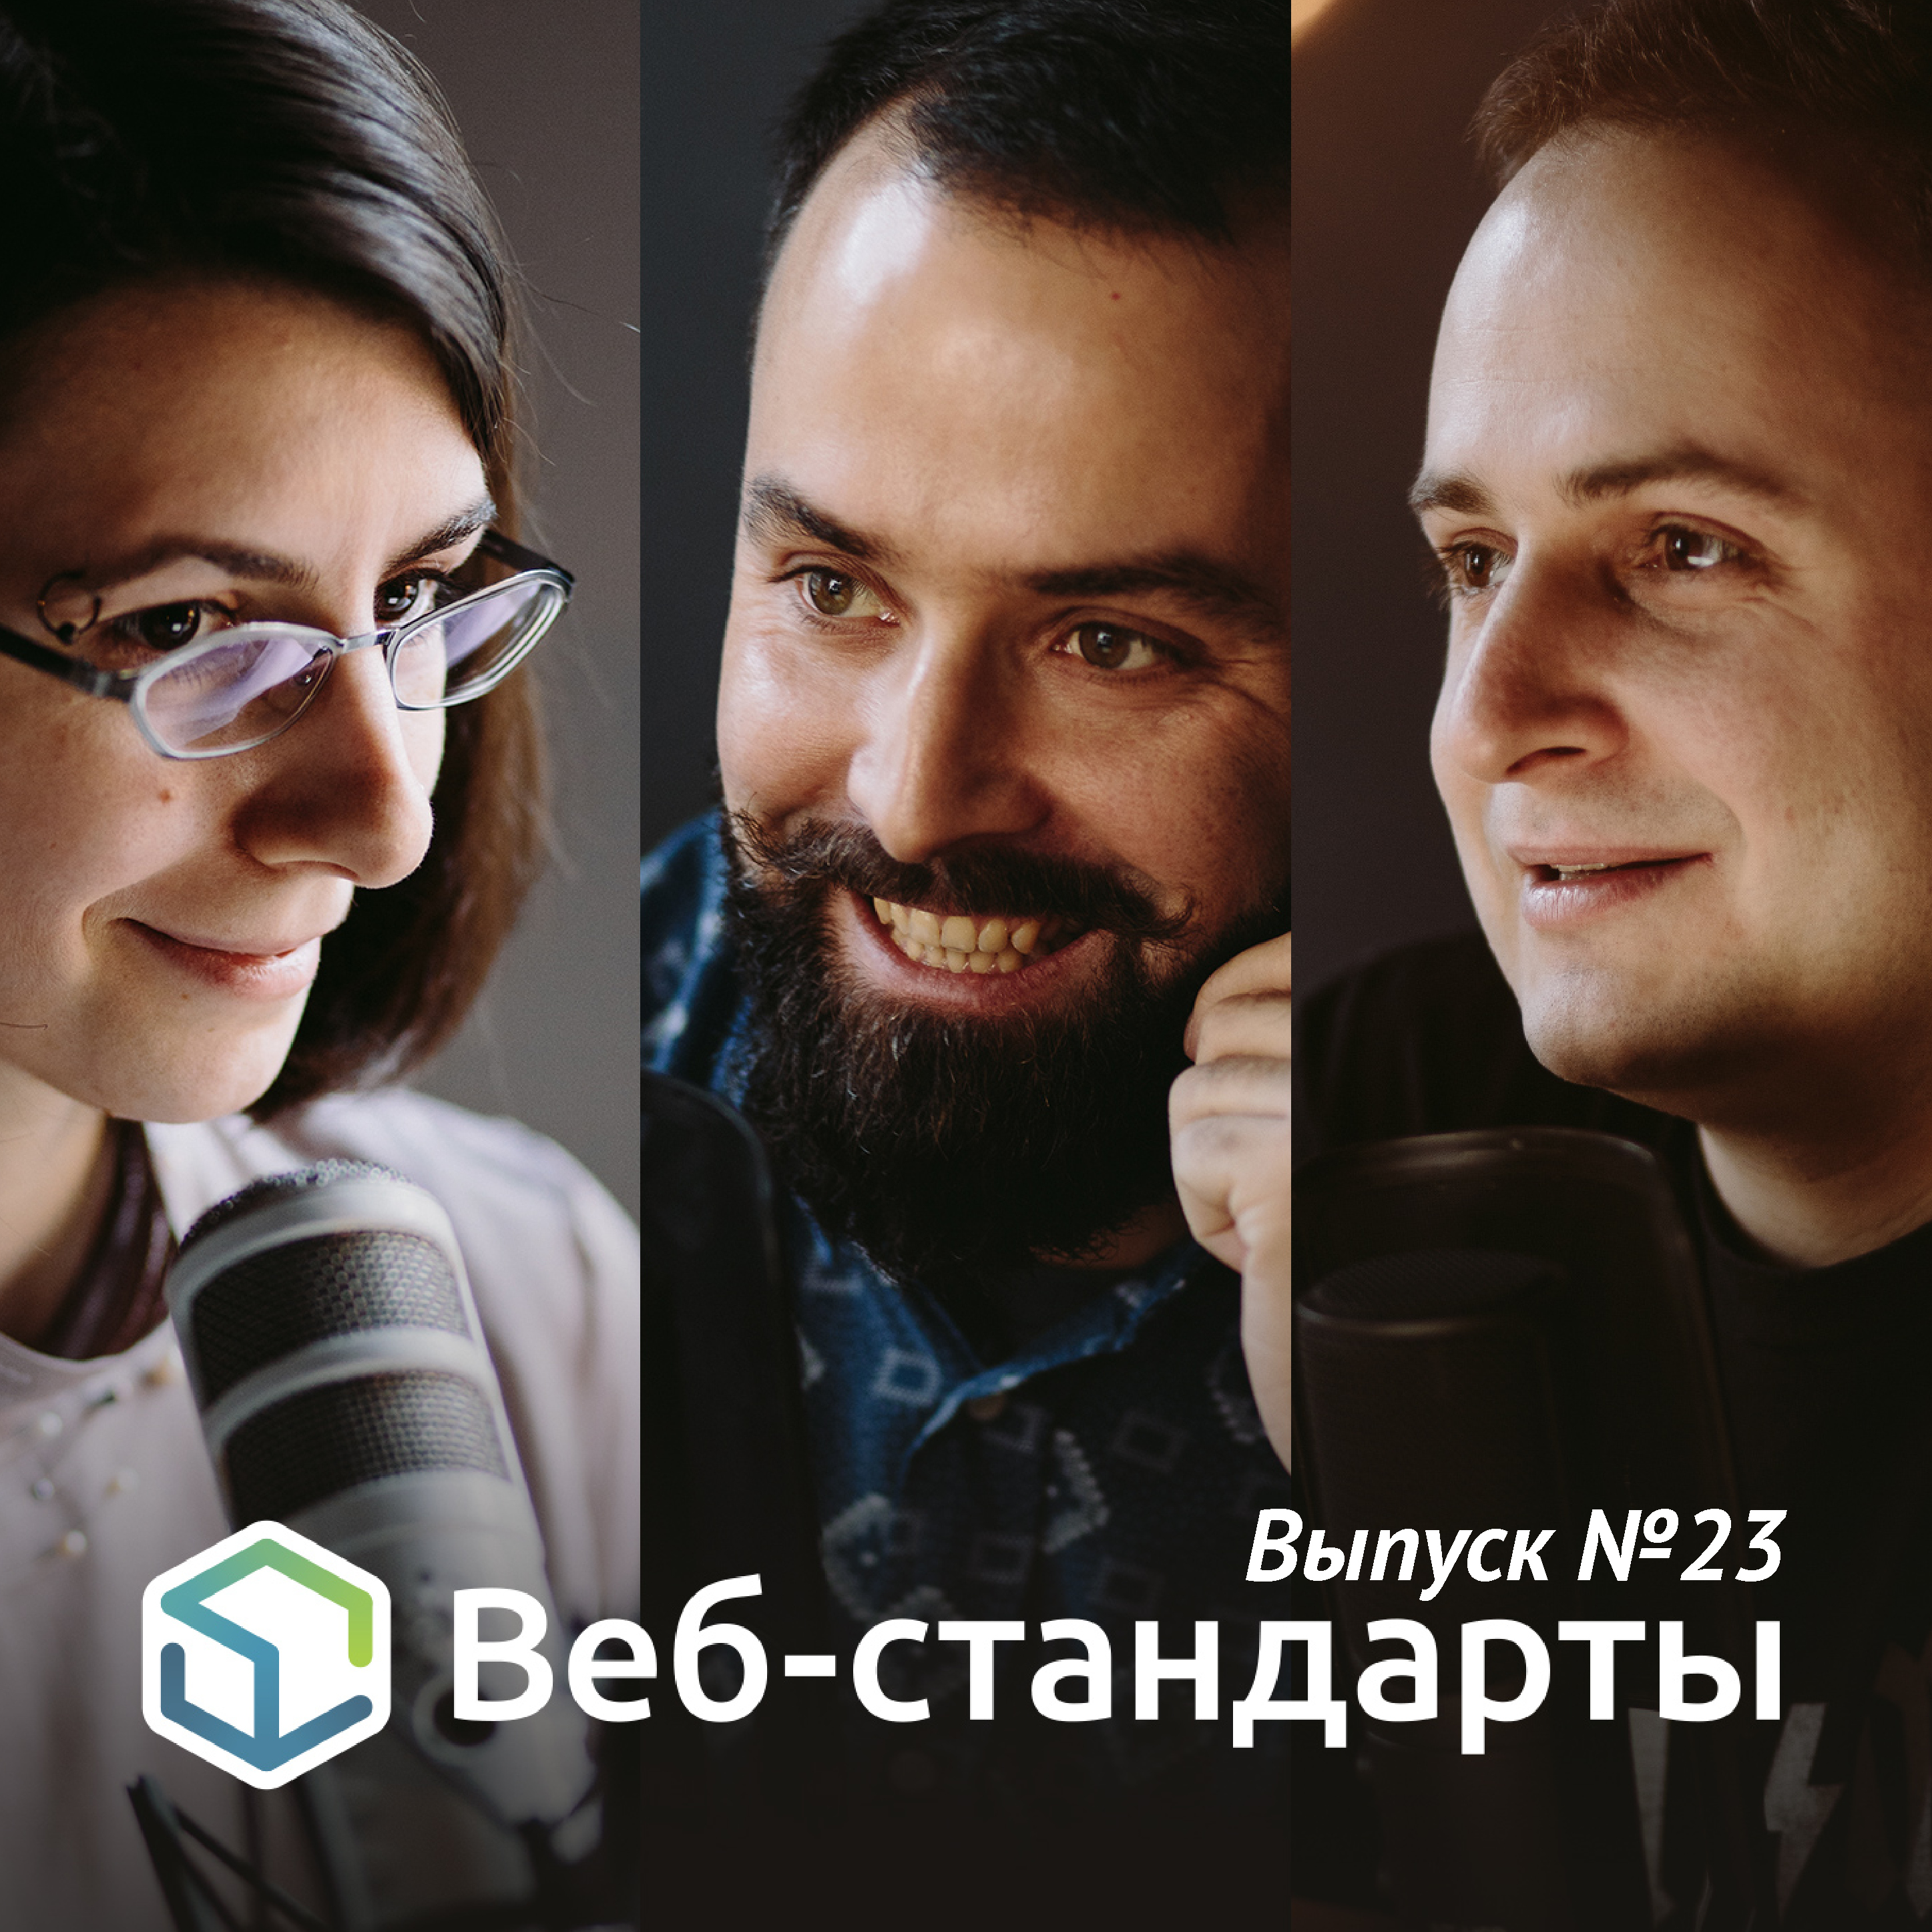 Алексей Симоненко Выпуск №23 алексей номейн html шпаргалка